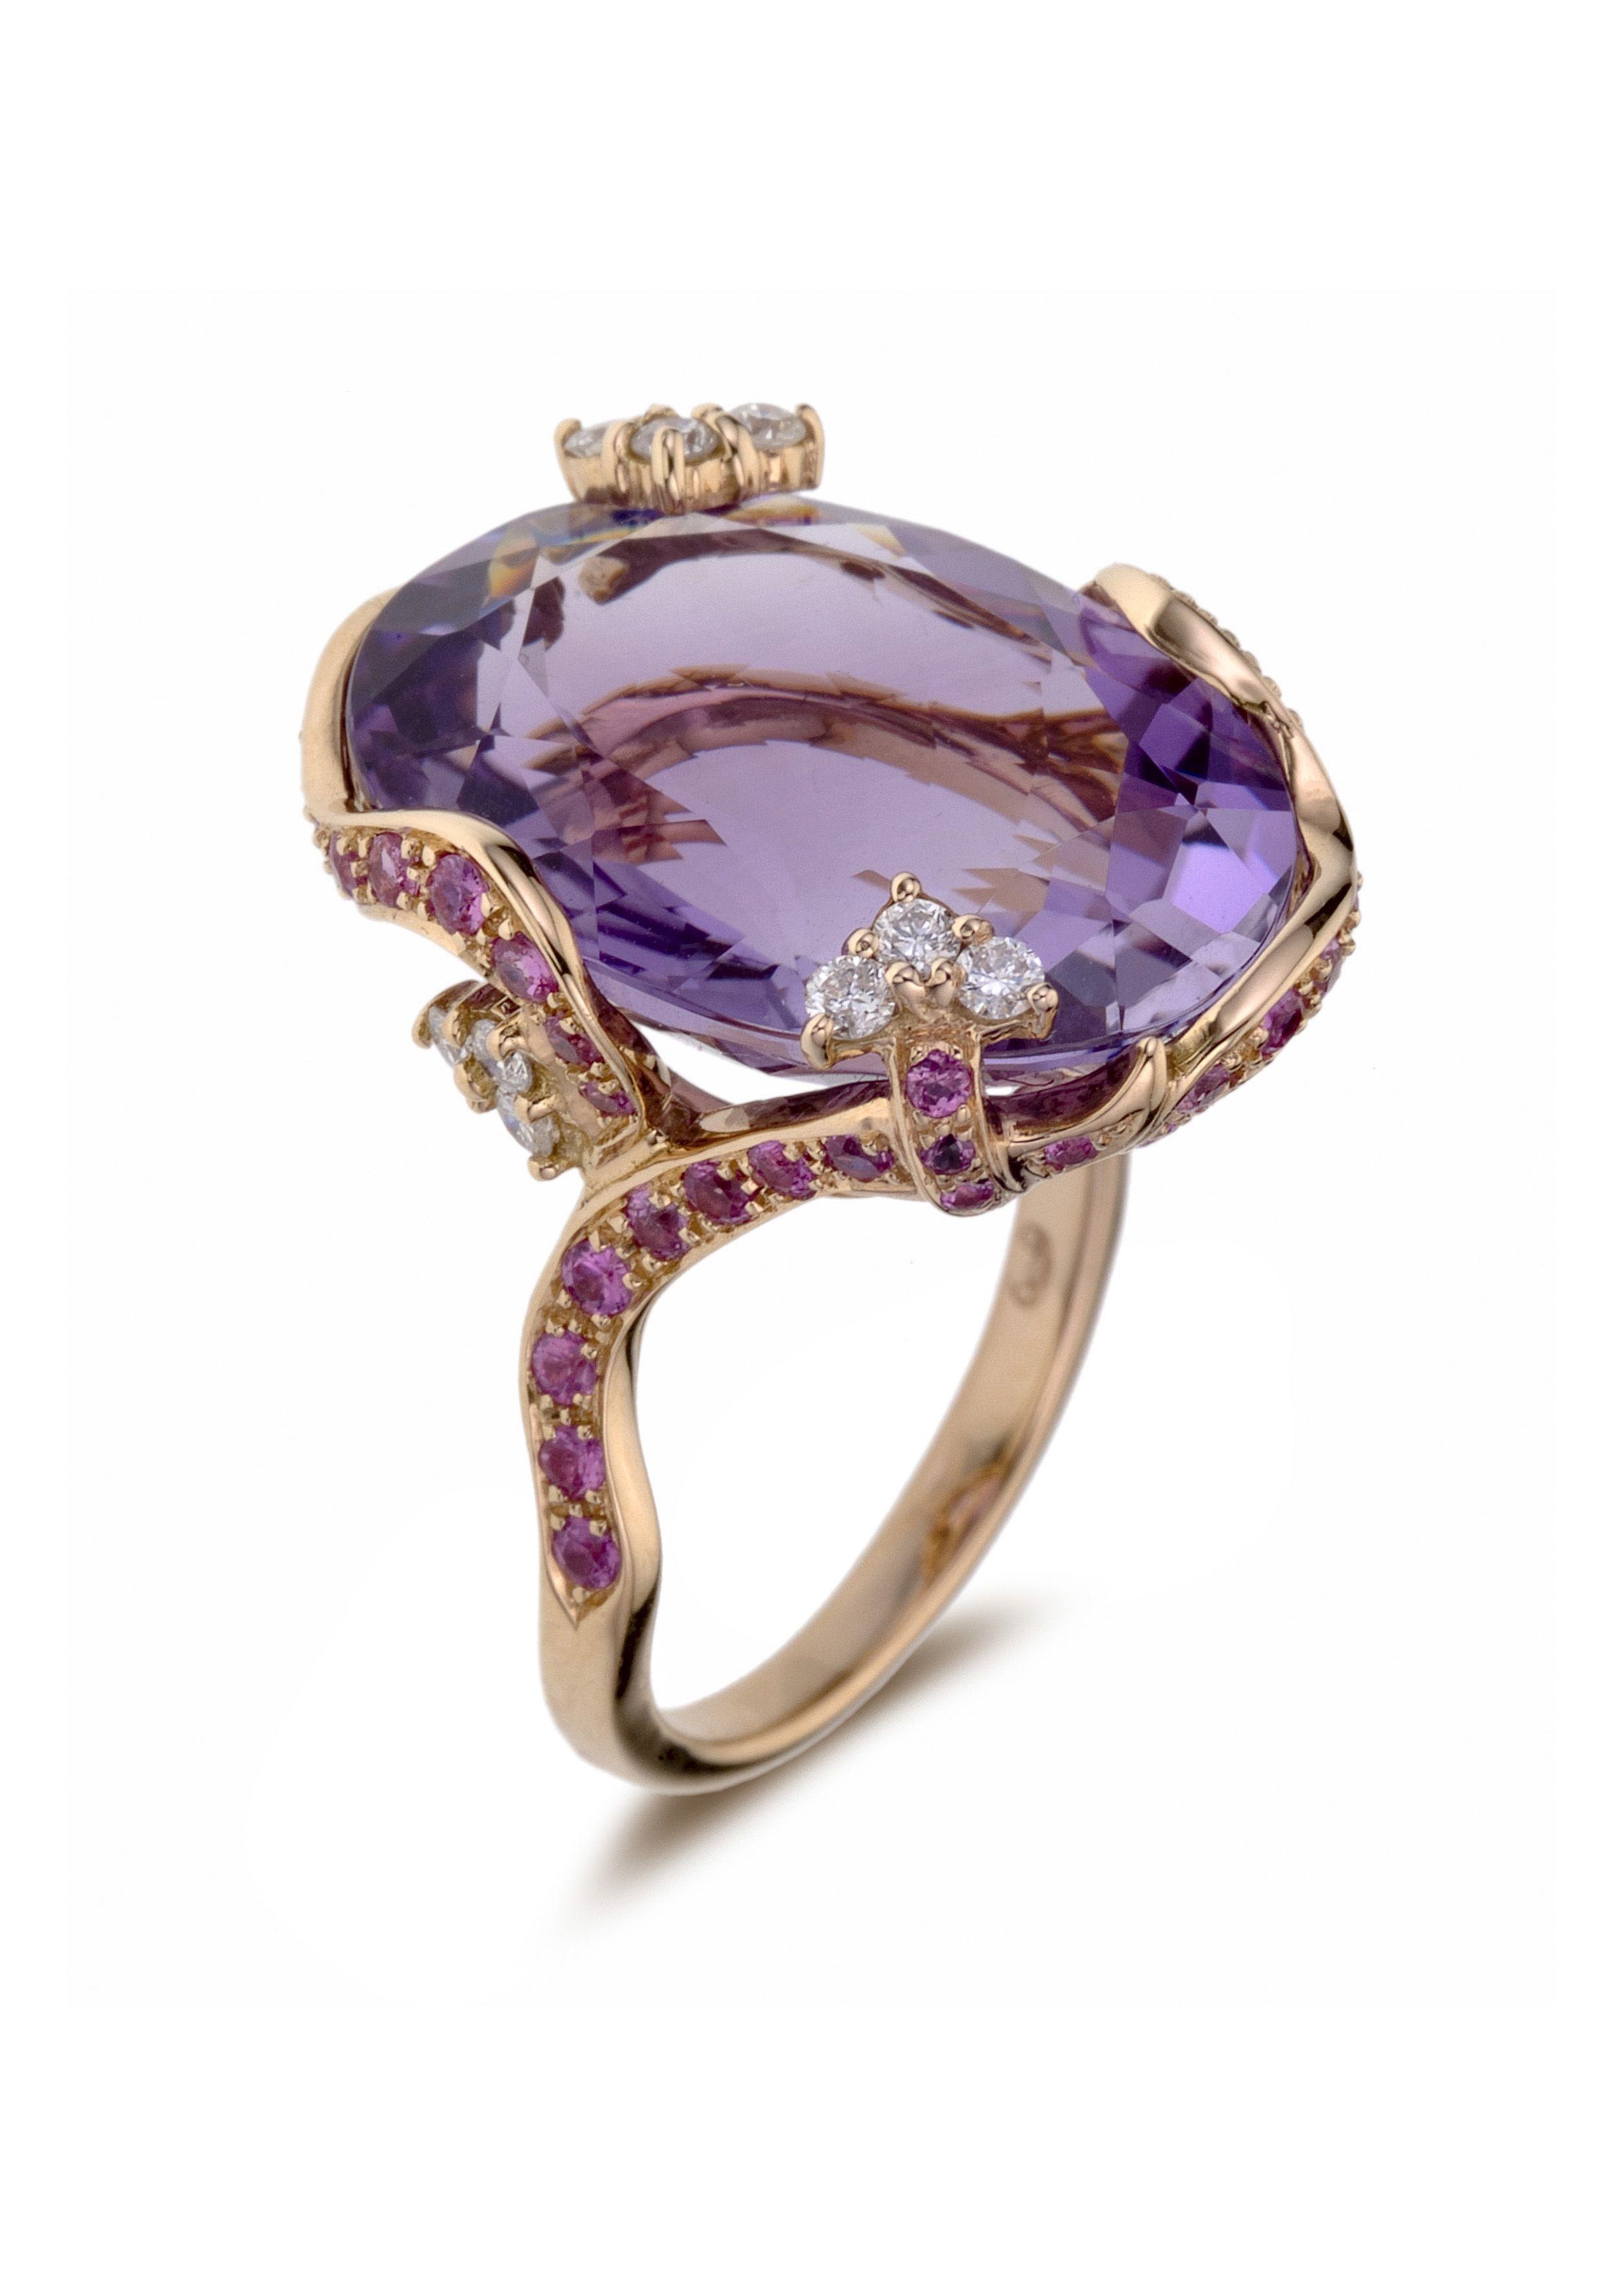 Amethyst, Pink Sapphire and Diamond Ring   Bague améthyste, saphir rose et  diamant 9500ebc2755b